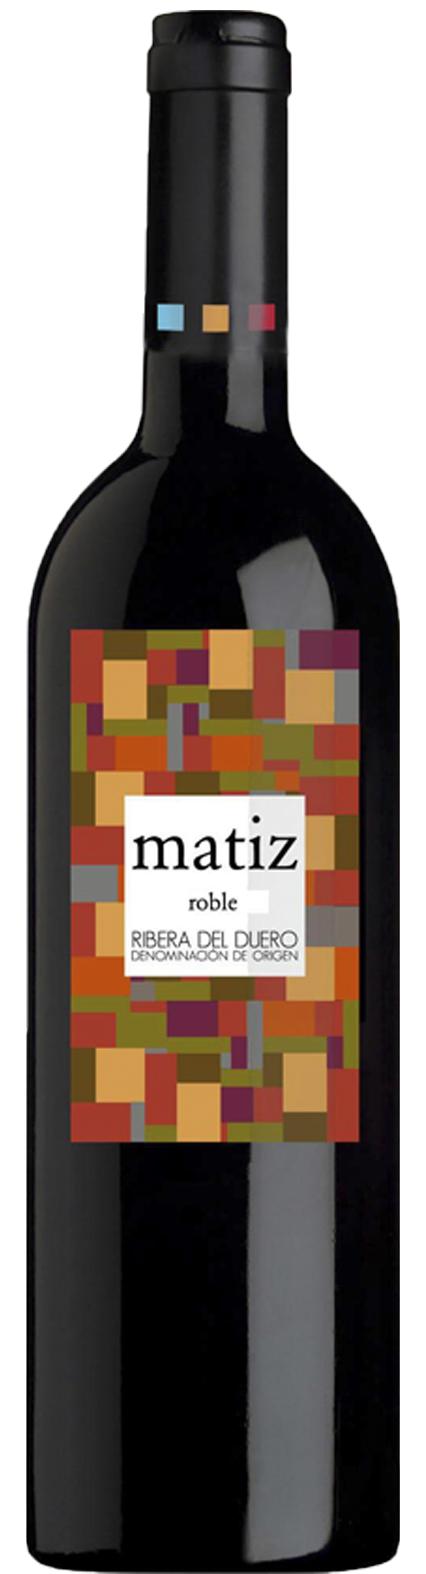 Matiz roble 2011